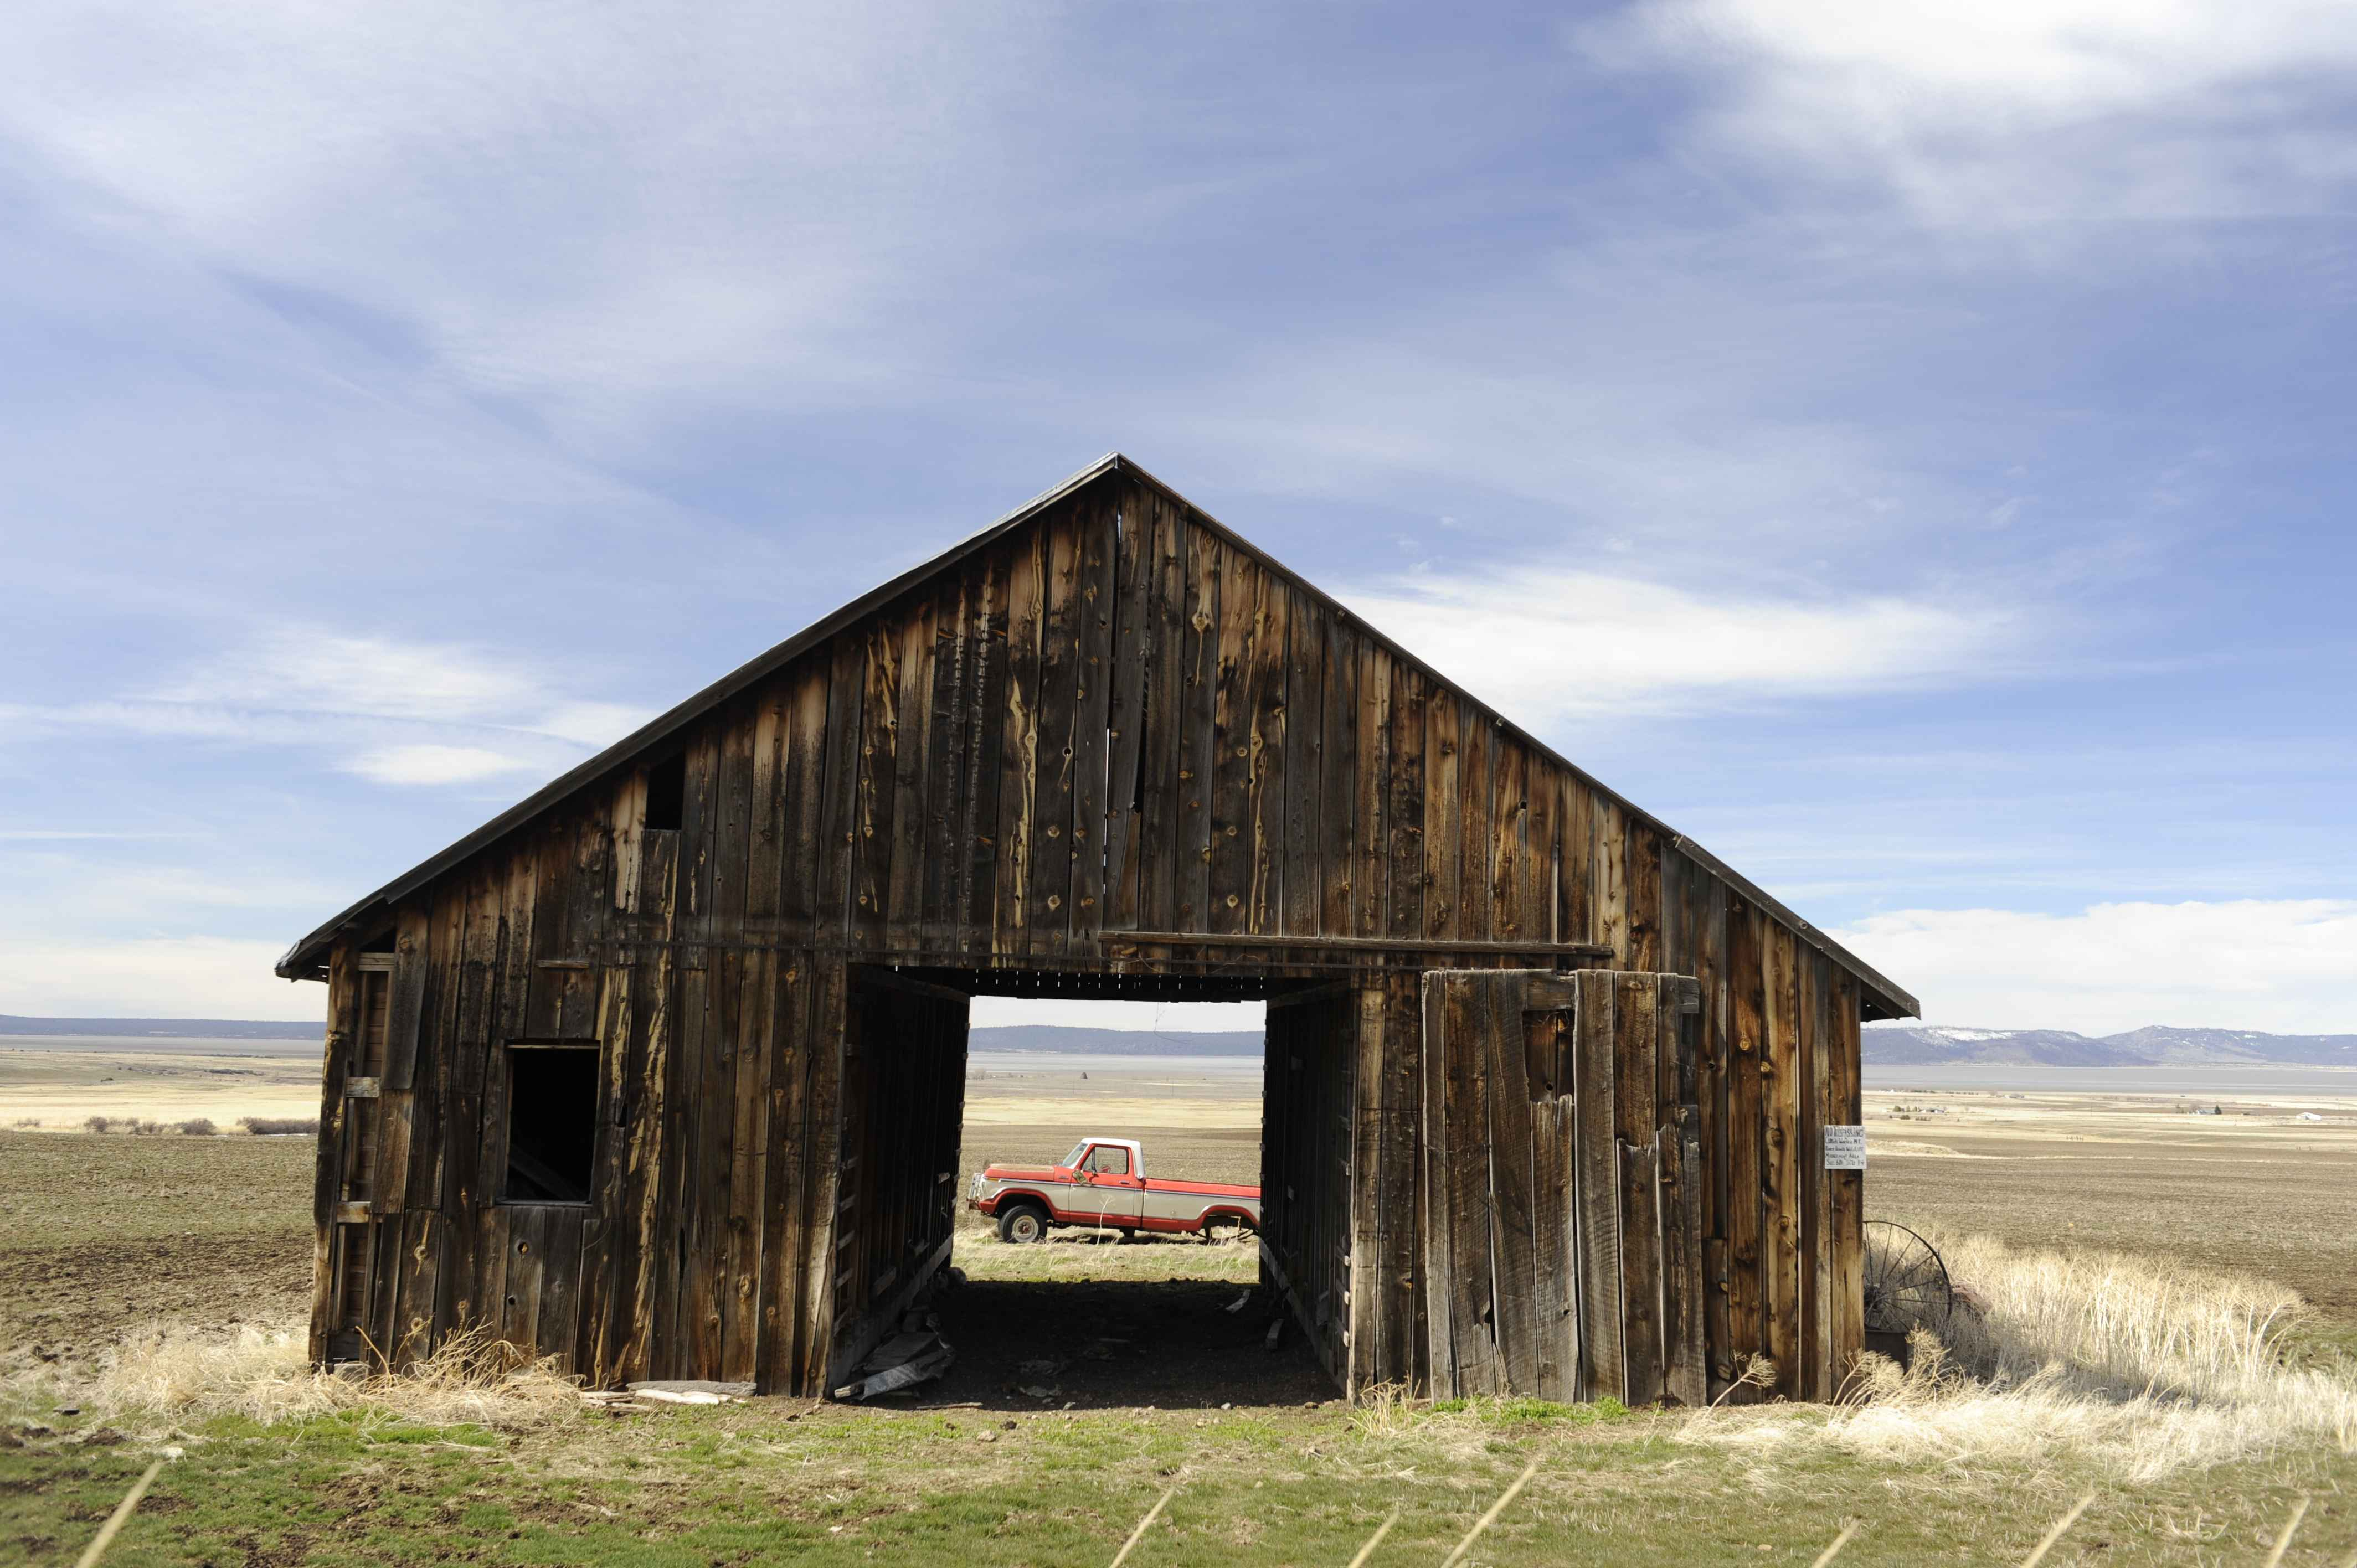 barn wallpaper - photo #21